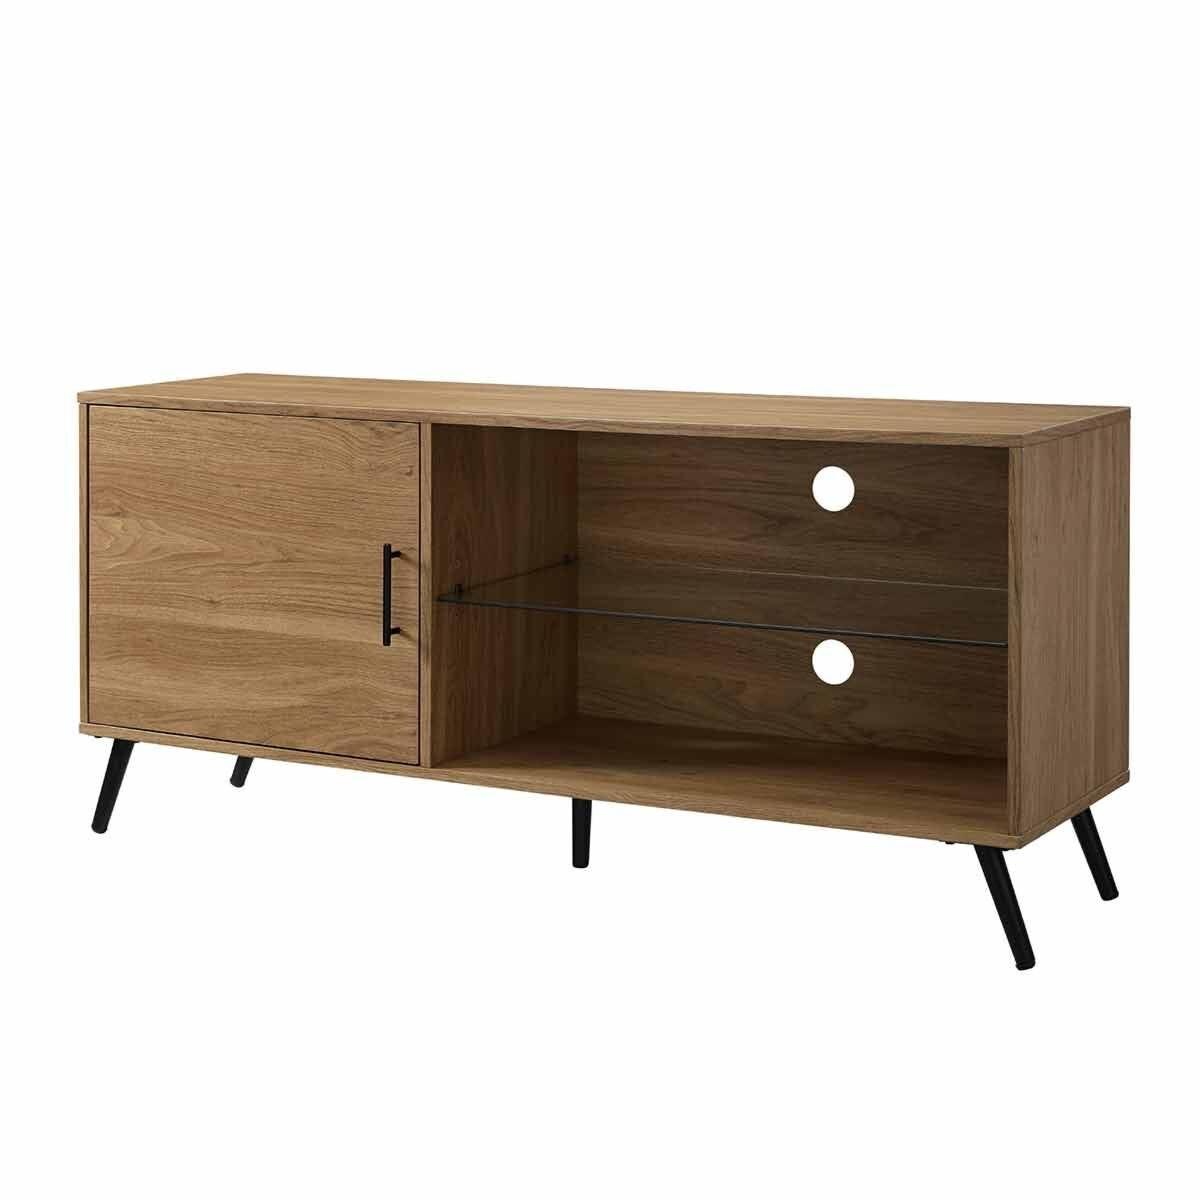 Potenza Mid Century Modern Wood TV Stand Oak